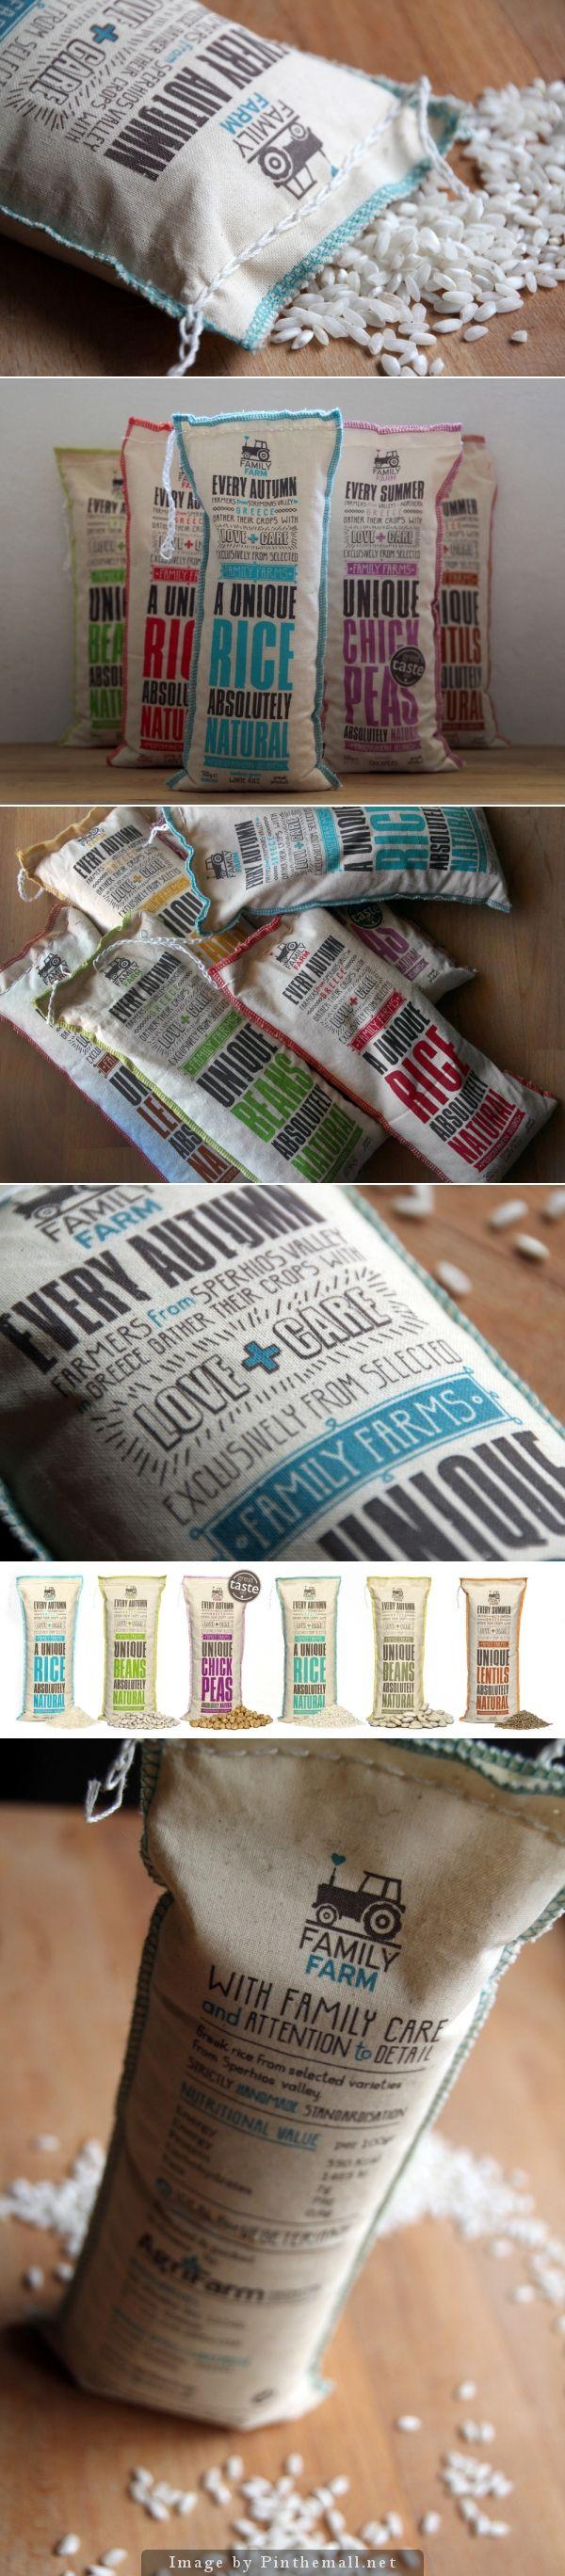 - Packaging - Food - Rice - Bag - Organic - Family Farm Pulses